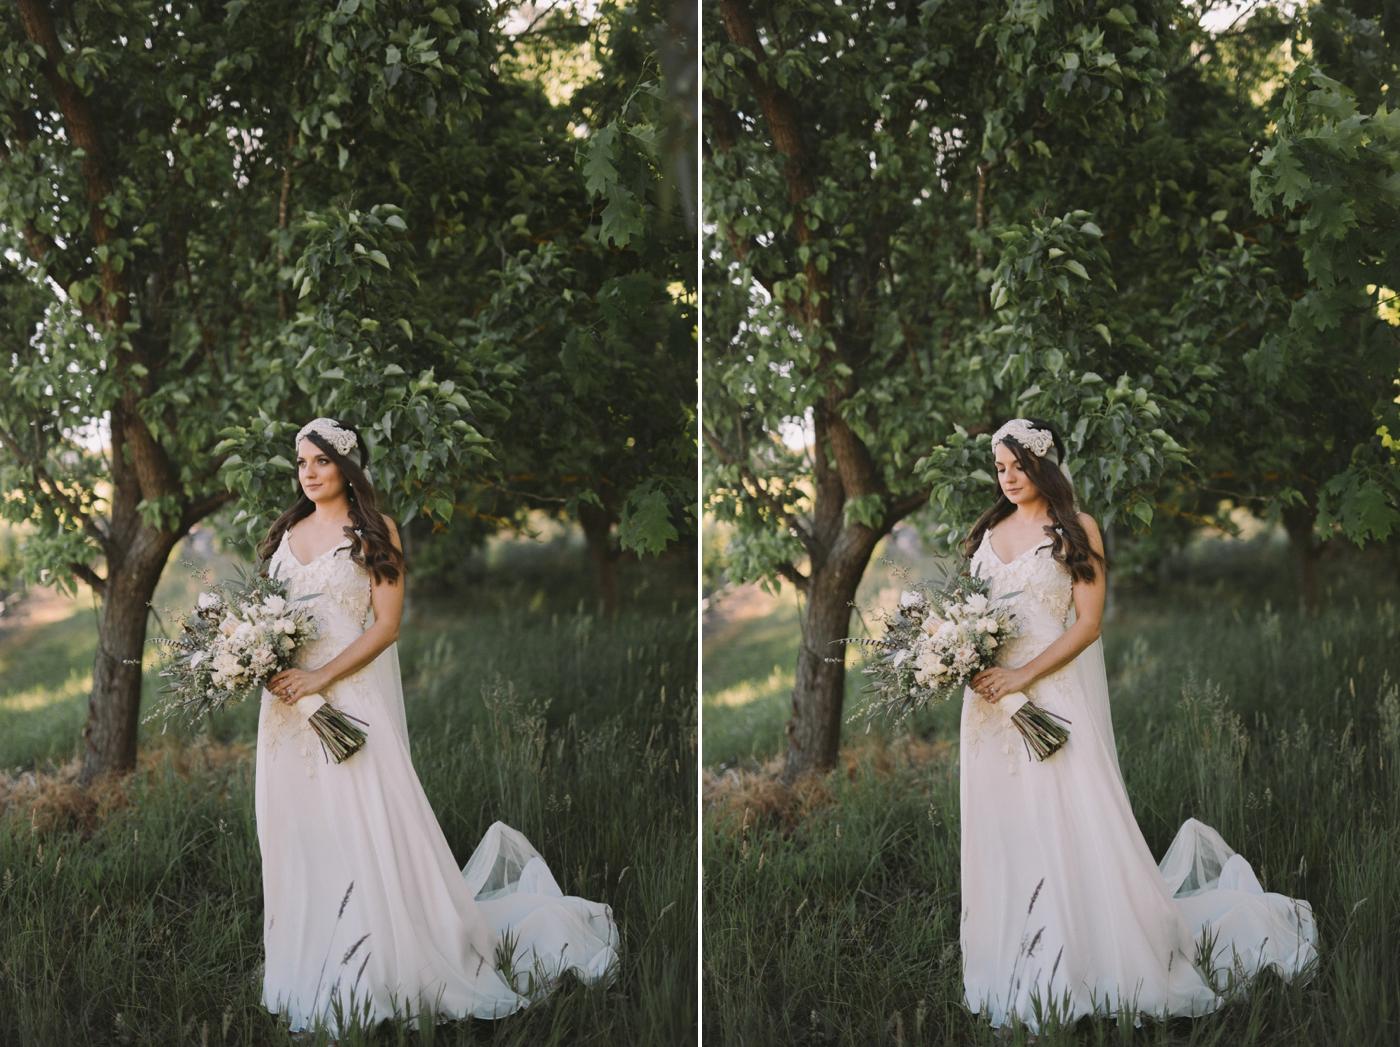 Maddy & Wes - K1 by Geoff Hardy Wedding - Adelaide Wedding Photographer - Natural wedding photography in Adelaide - Katherine Schultz_0043.jpg